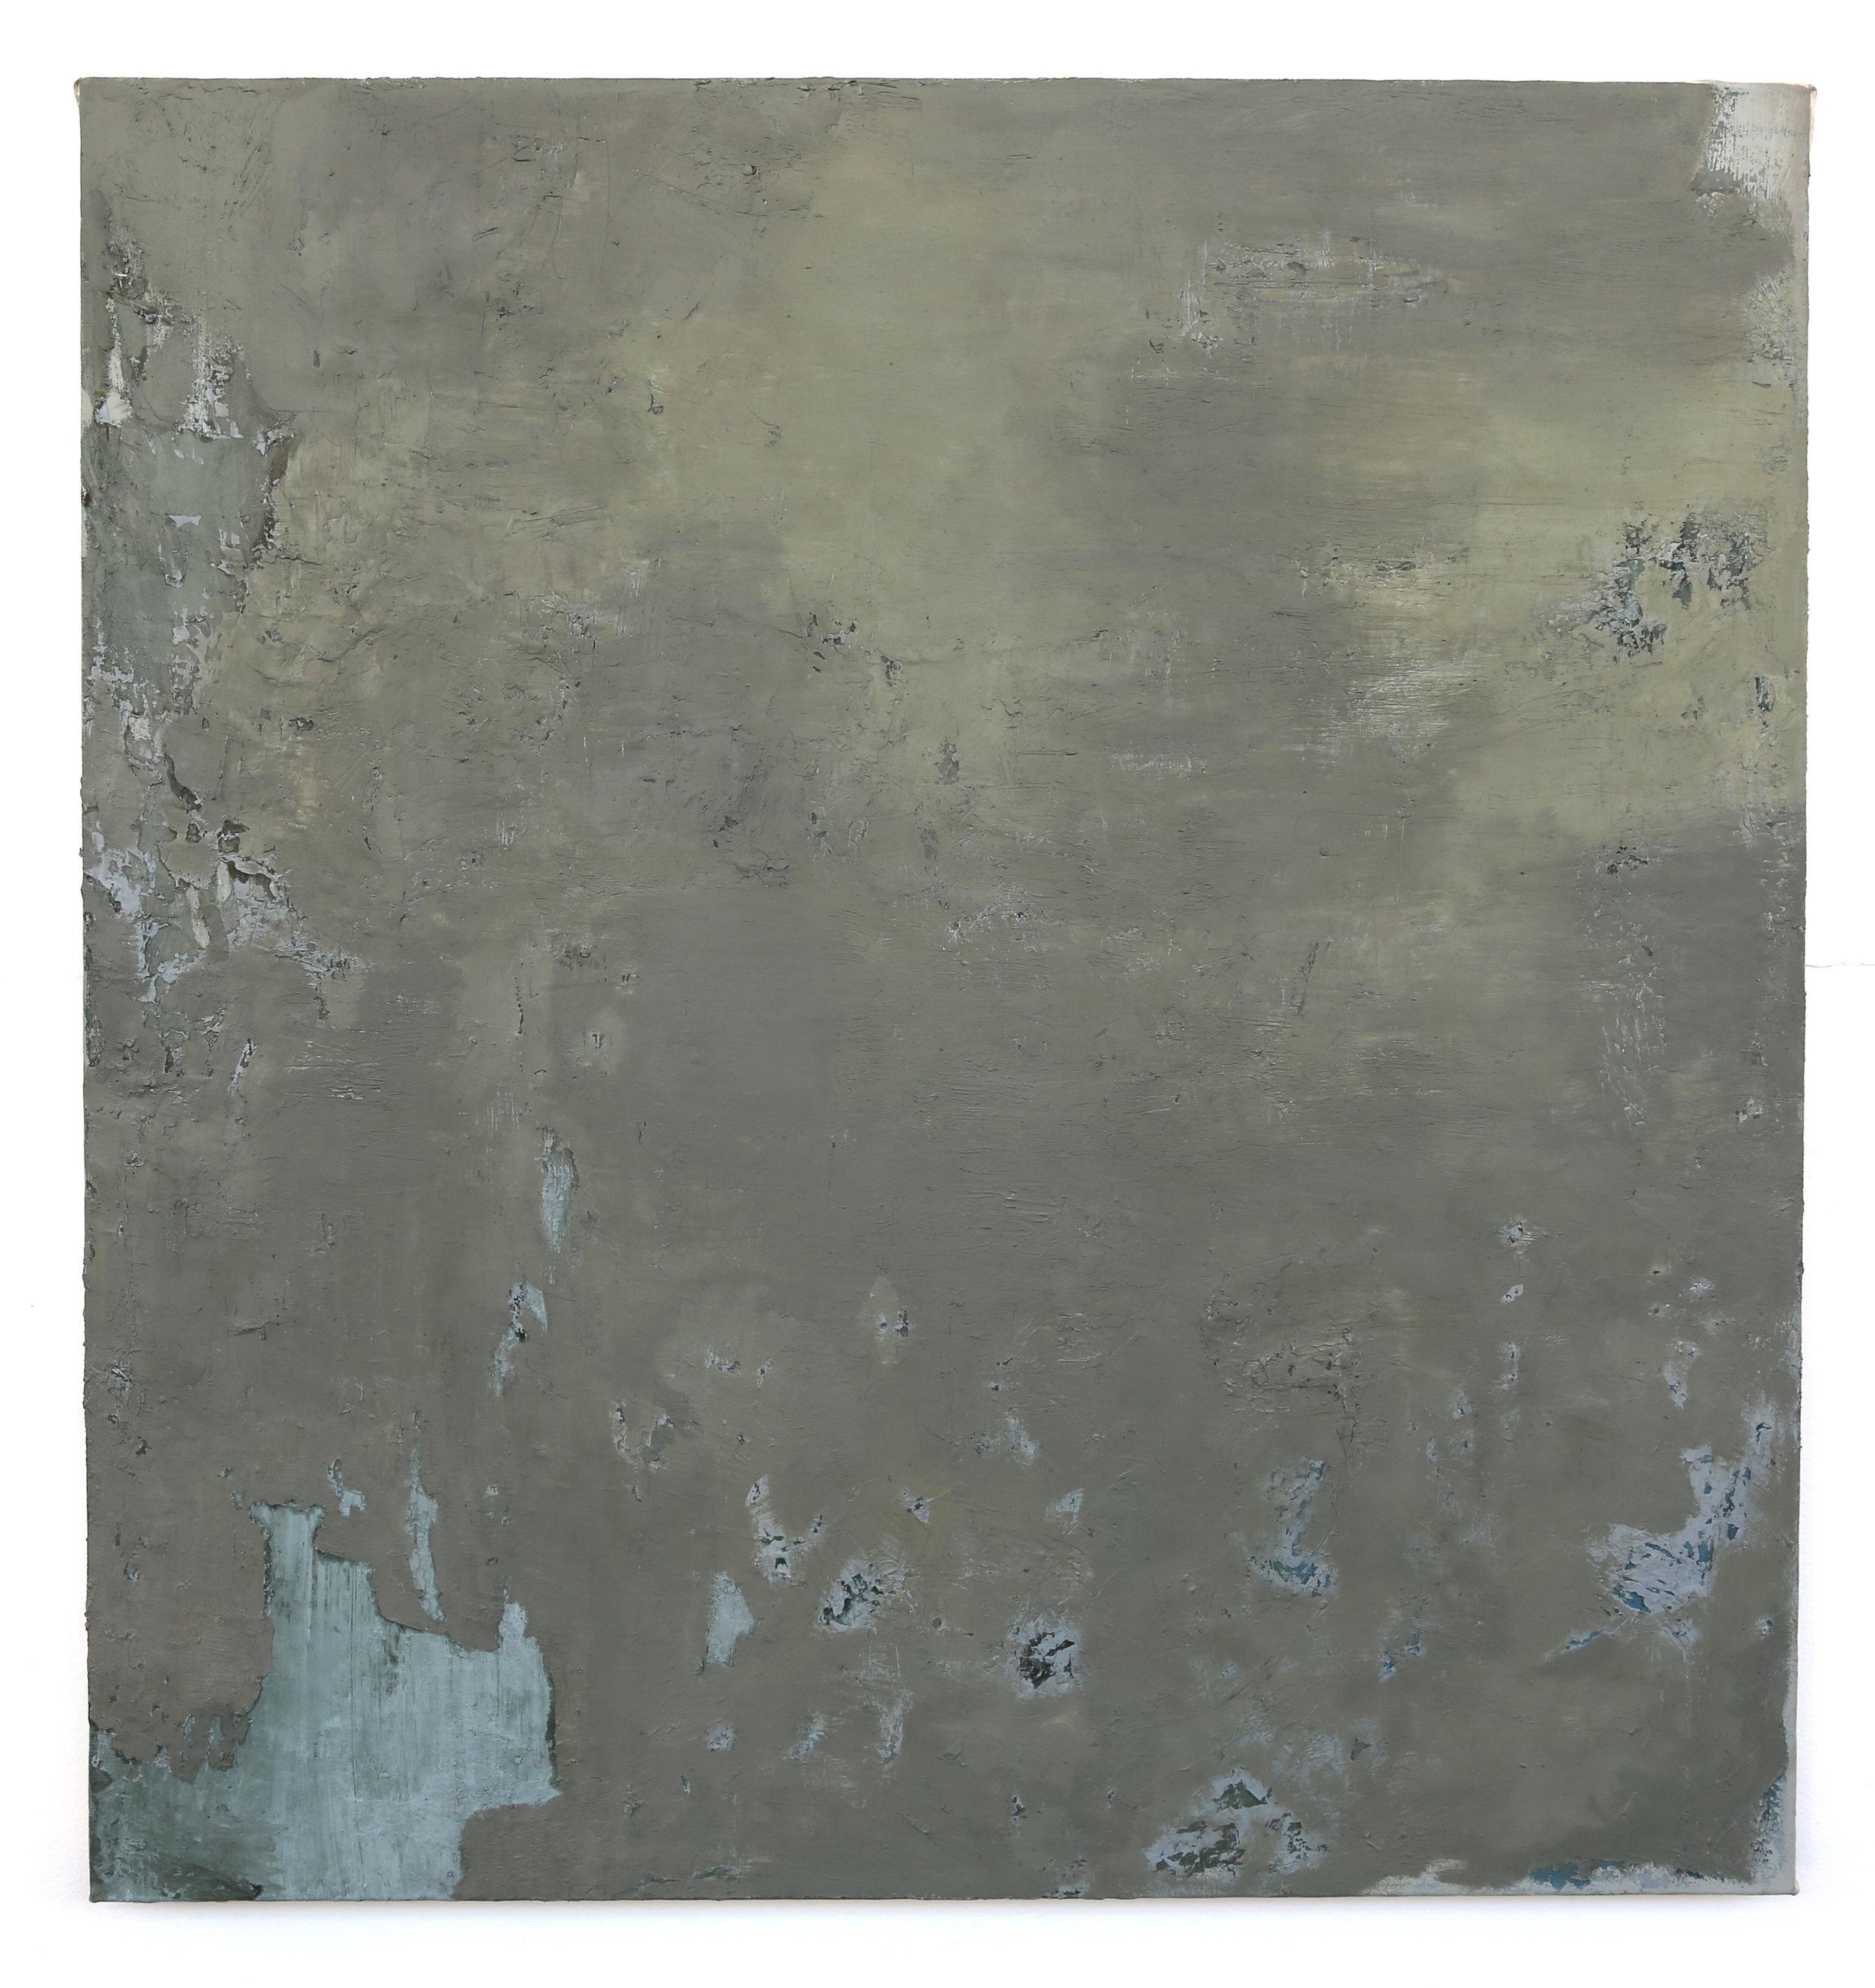 Concrete Slab #1